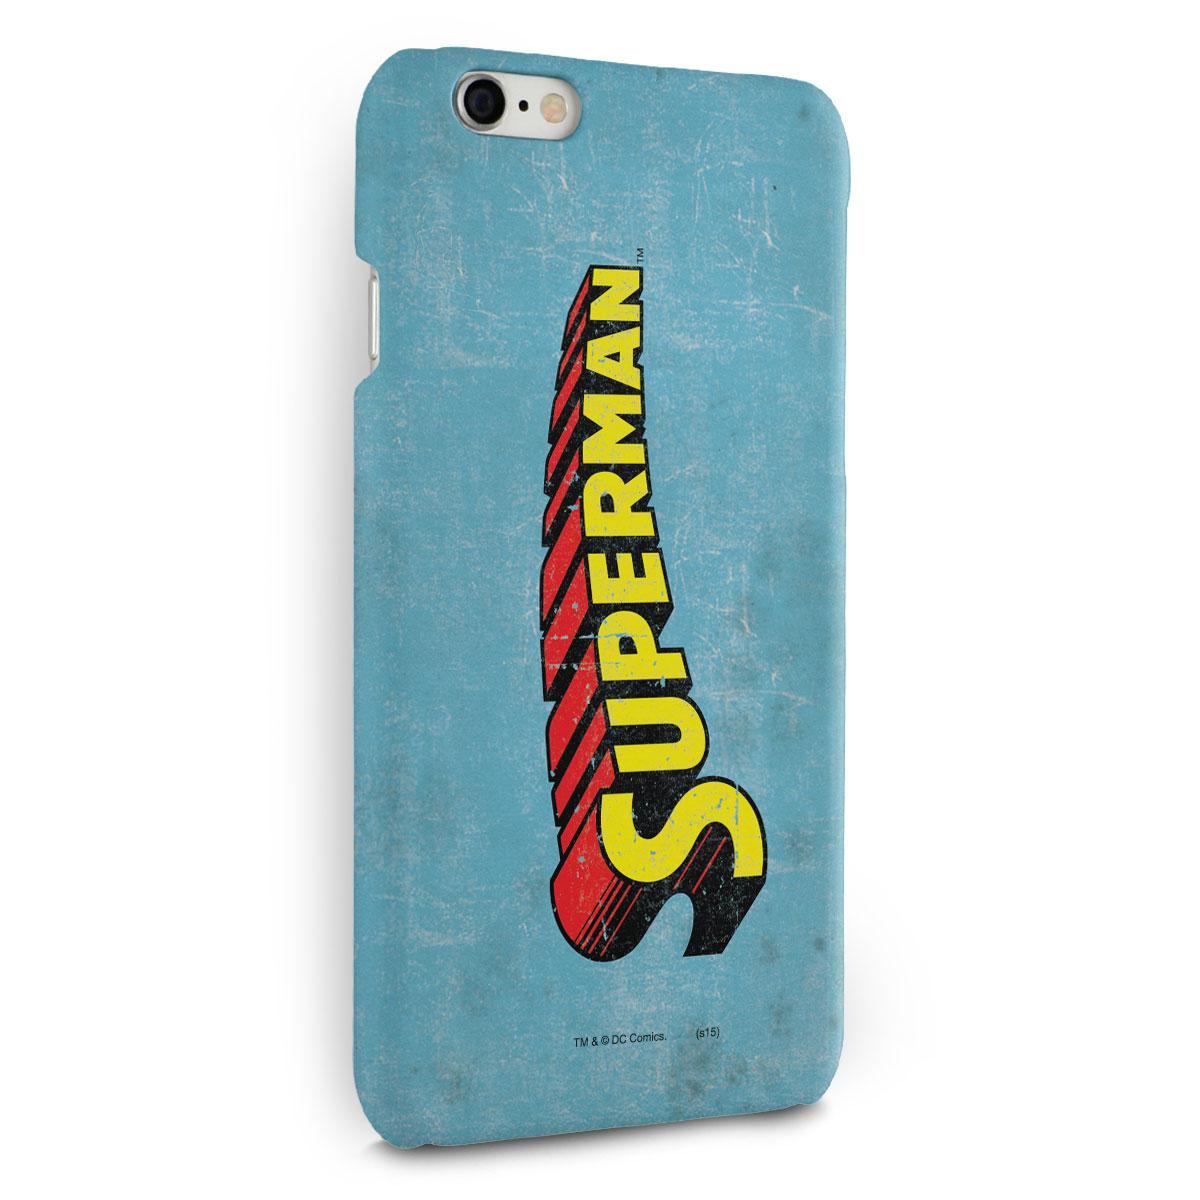 Capa para iPhone 6/6S Plus Superman Logo Clássico